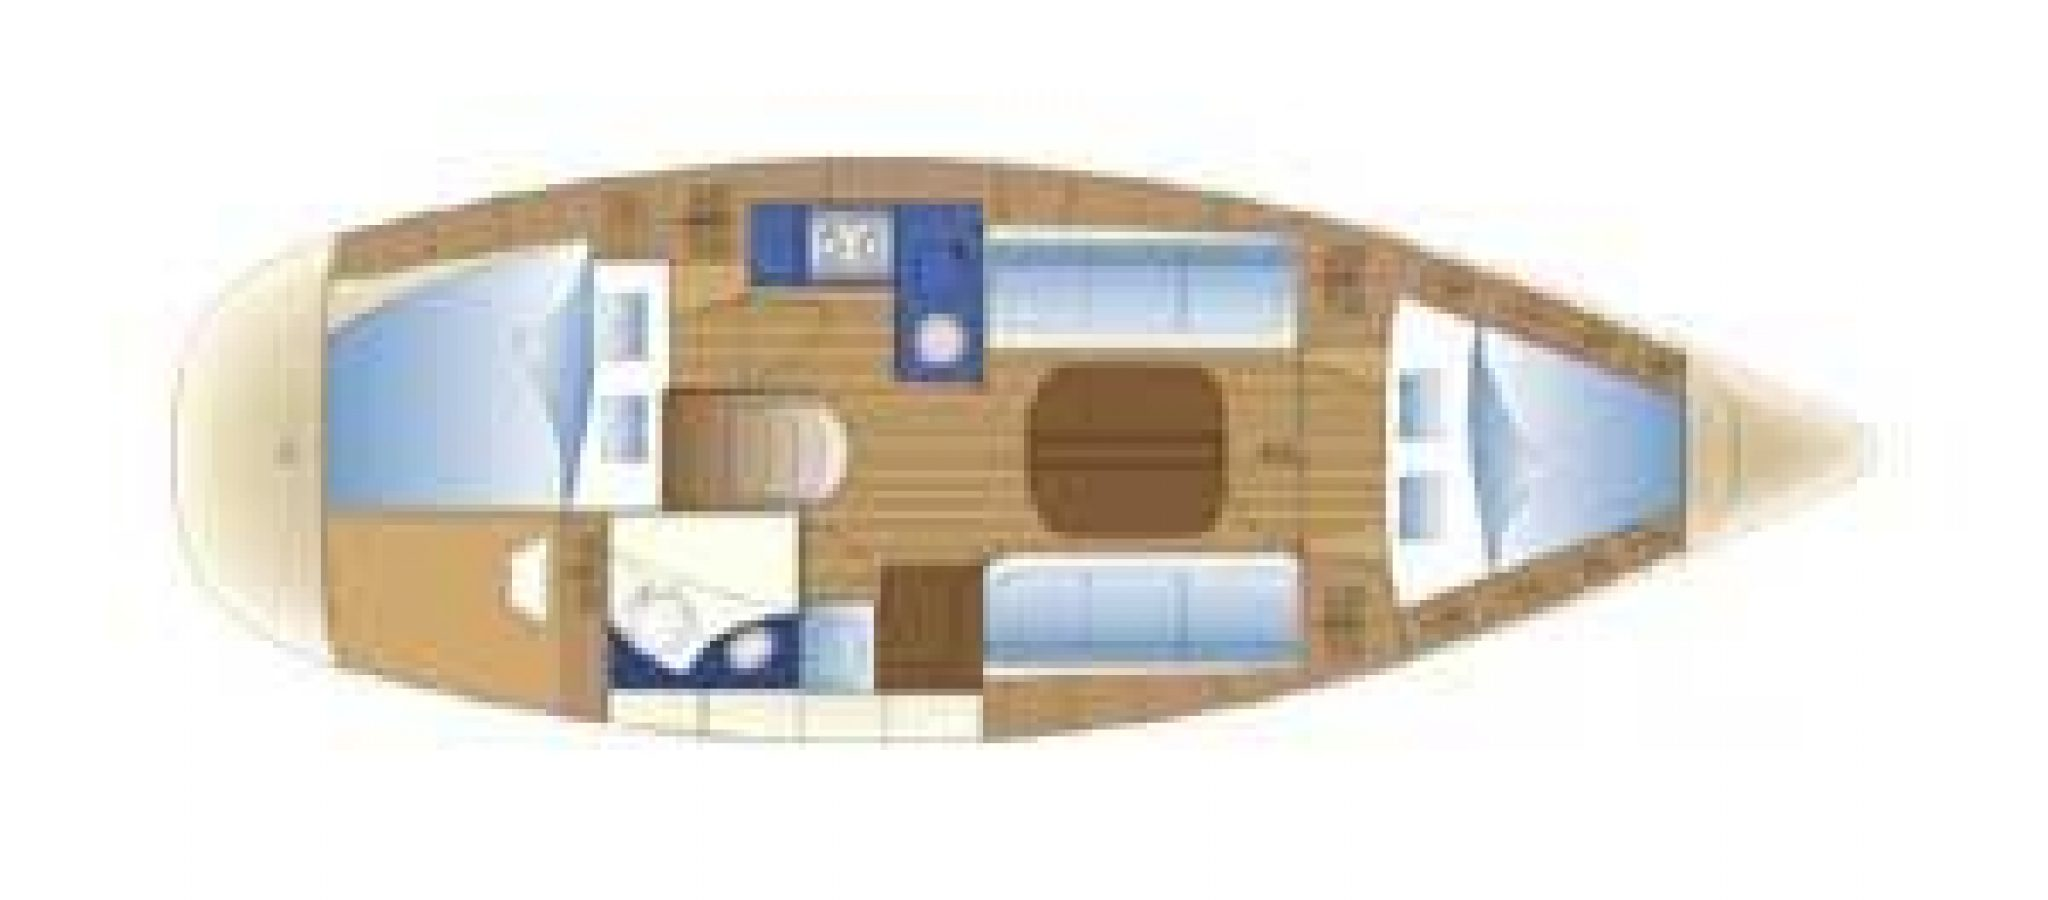 Bavaria 32 cruiser plan 32 cabines